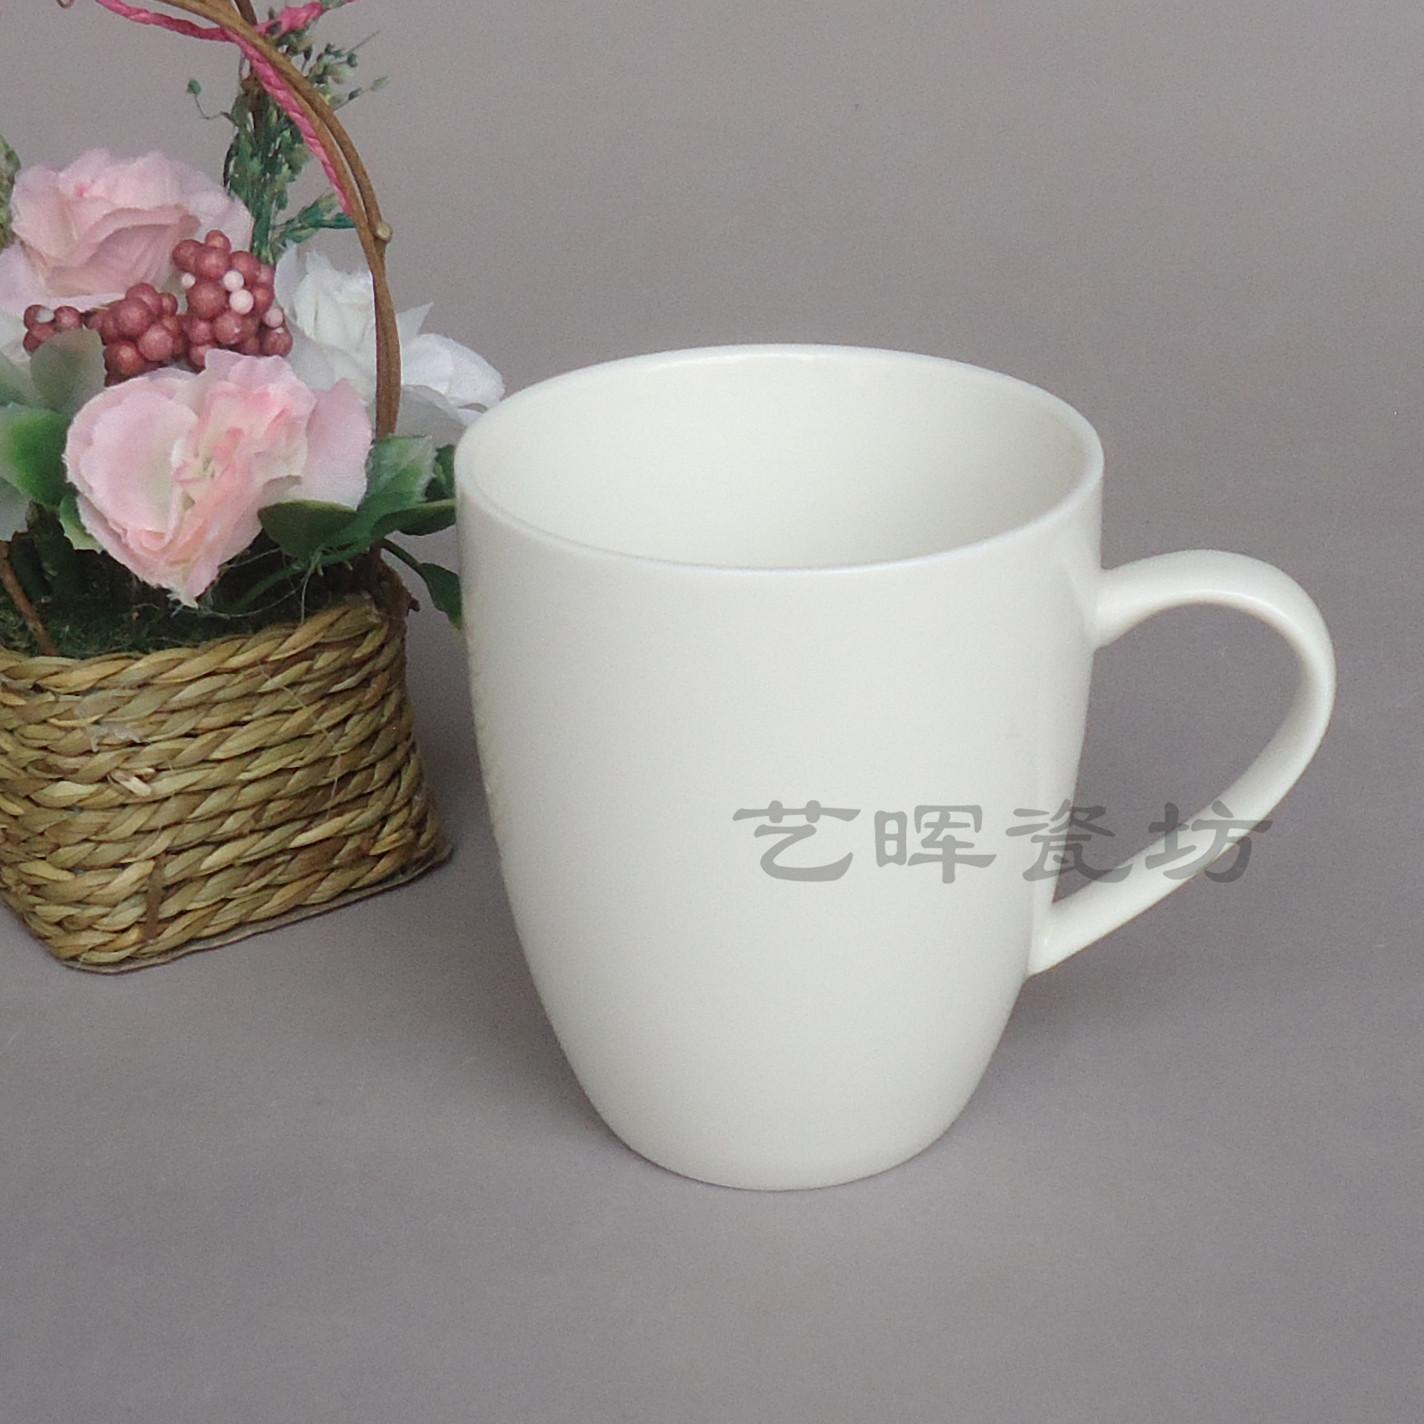 Buy Modern Brief Ceramic Mugs Coffee Cup